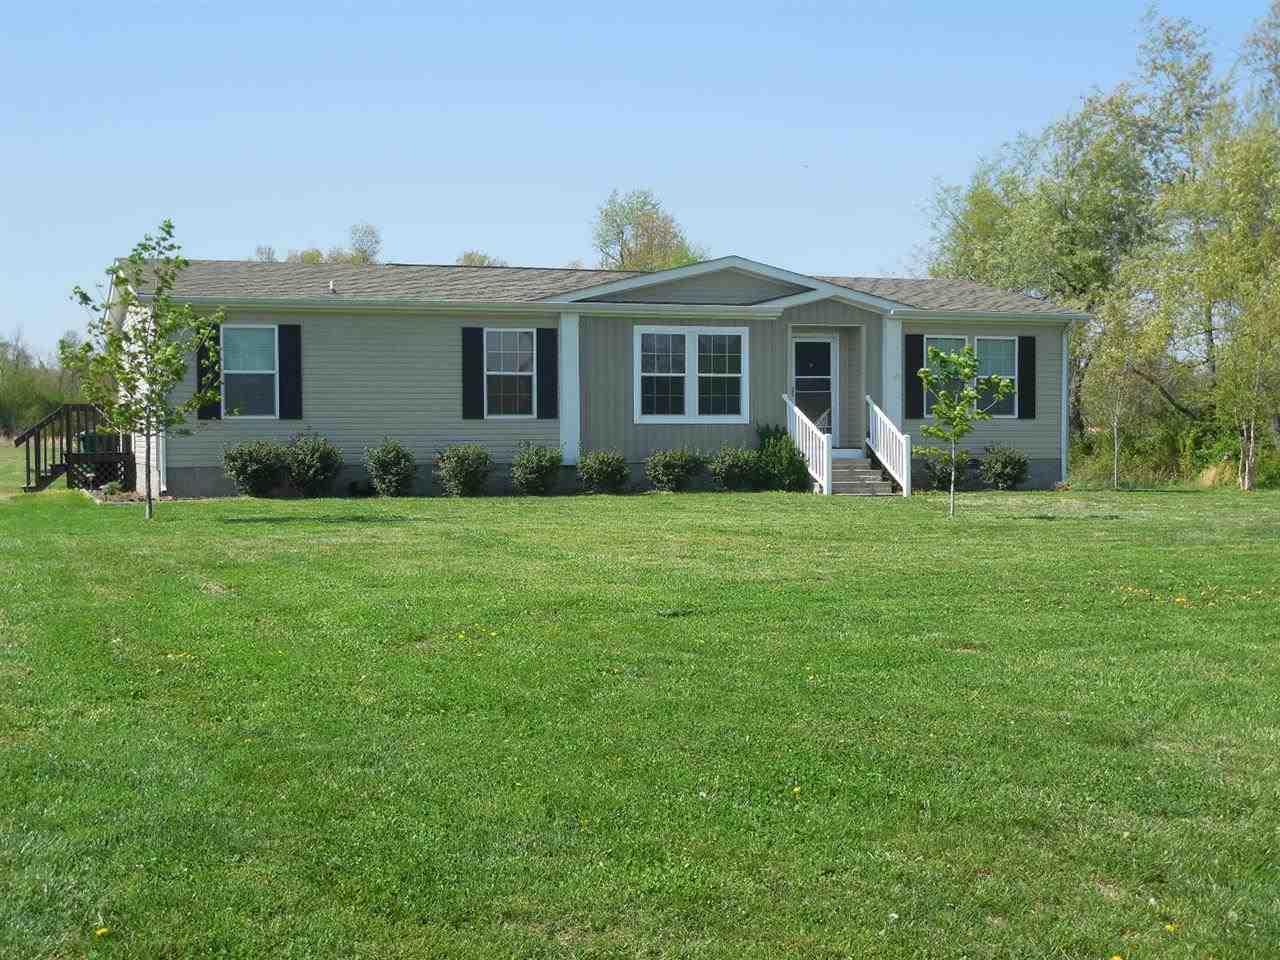 Real Estate for Sale, ListingId: 27856656, West Paducah,KY42086